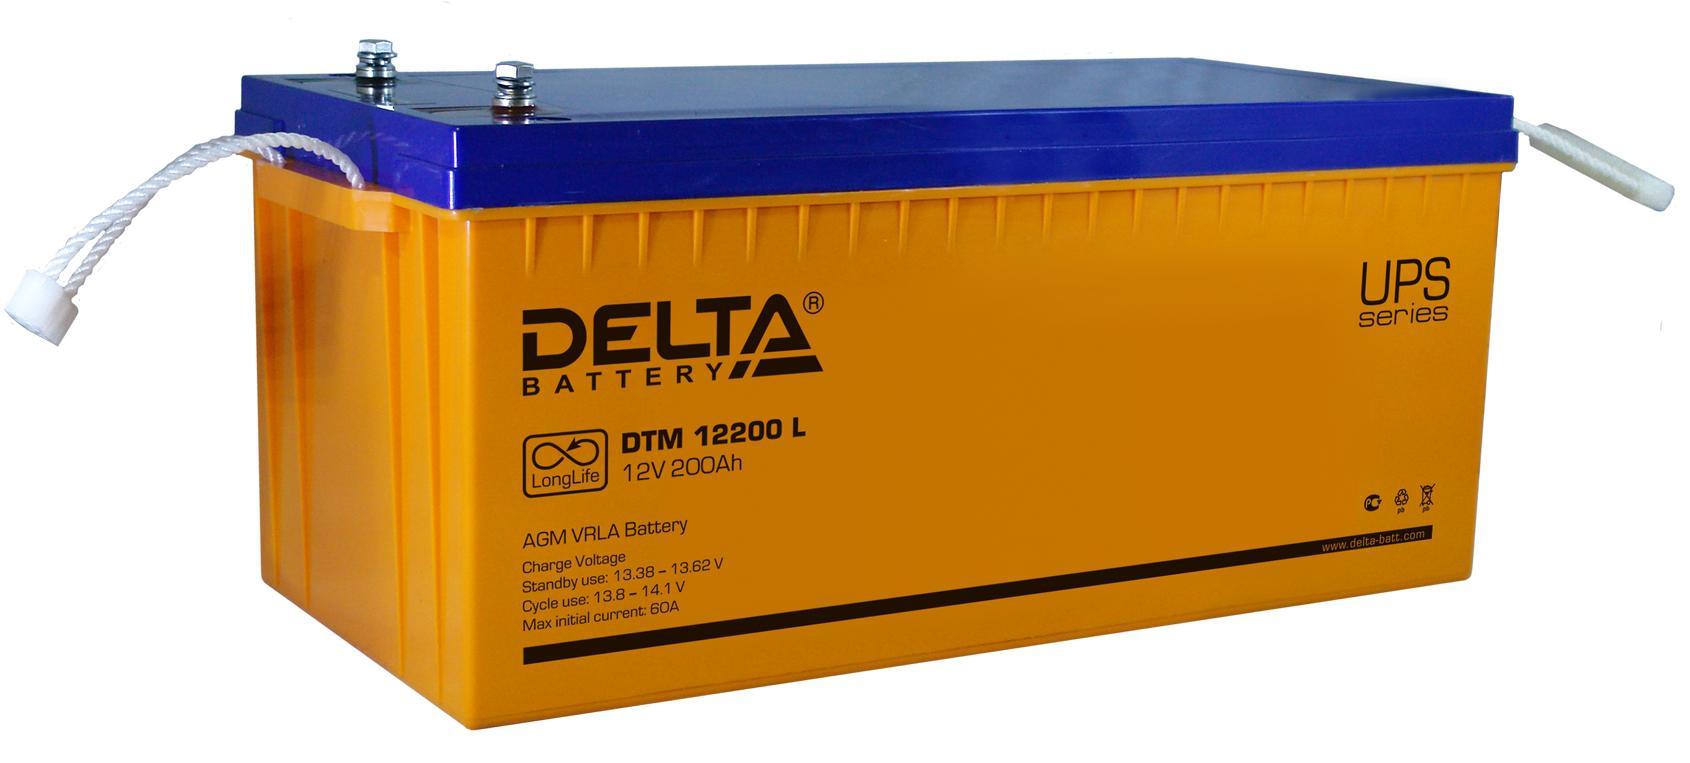 Аккумулятор для ИБП Delta Dtm 12200 l